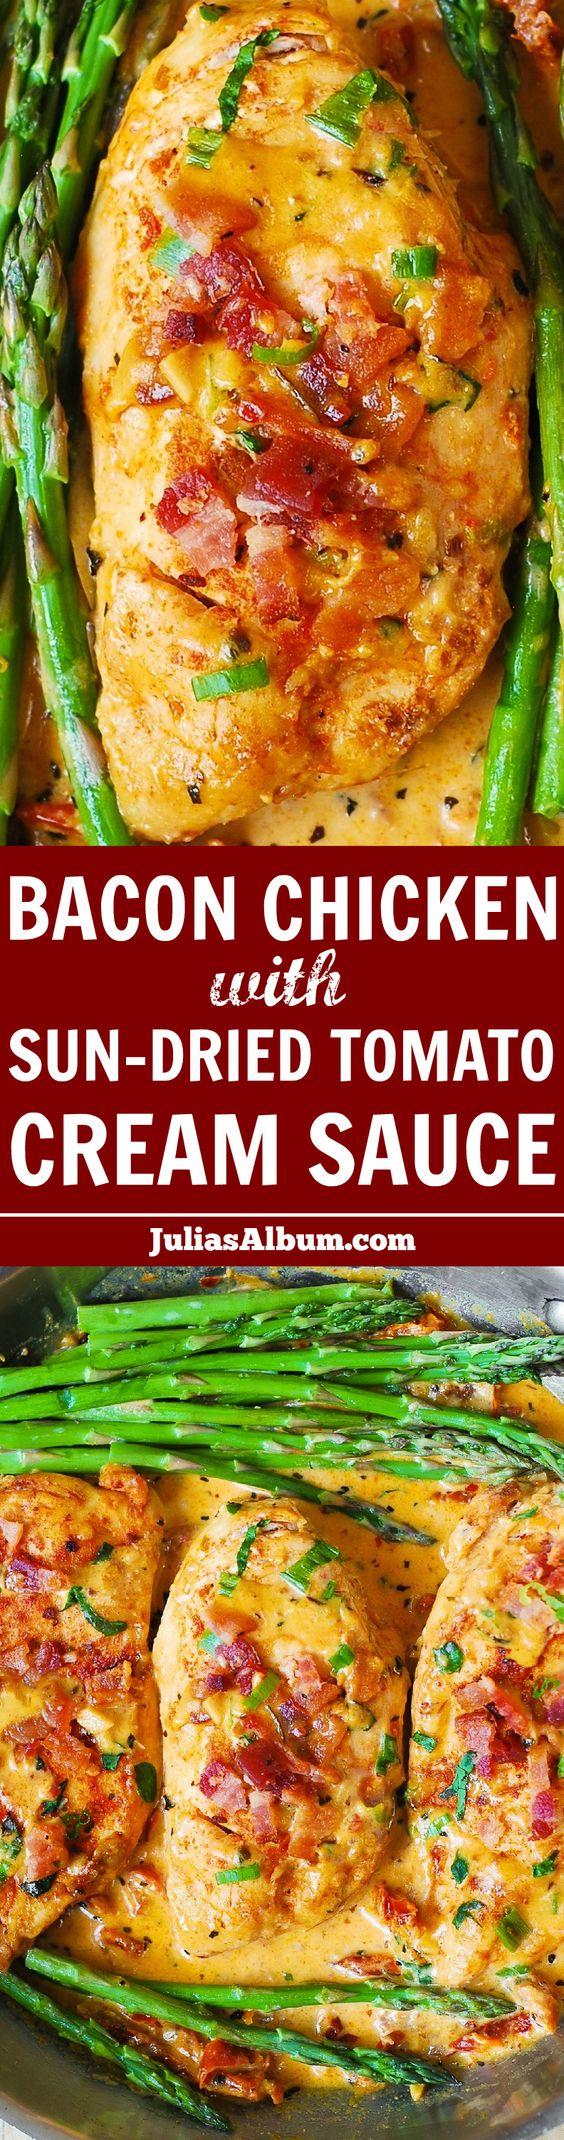 Sun Dried Tomato Cream Sauce Olive Garden